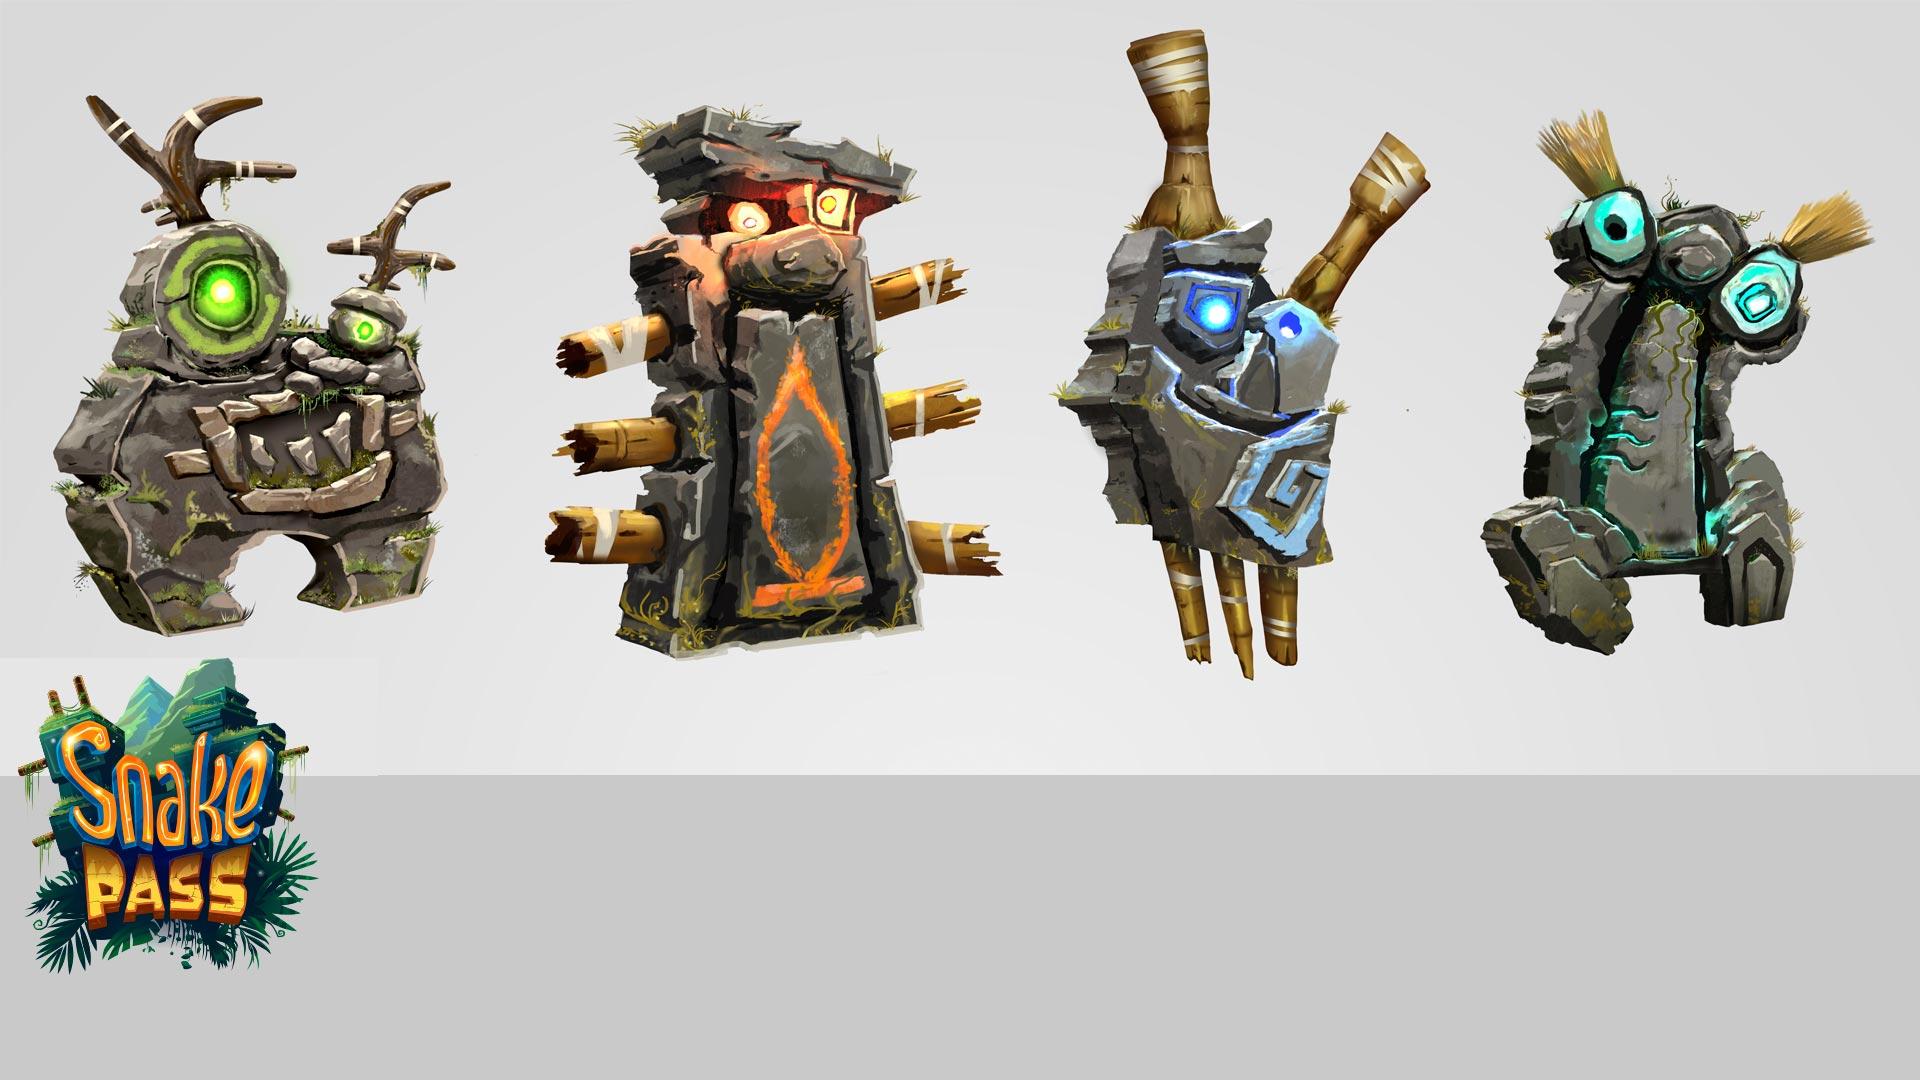 Snake_Pass_Idols_2_Concept.jpg